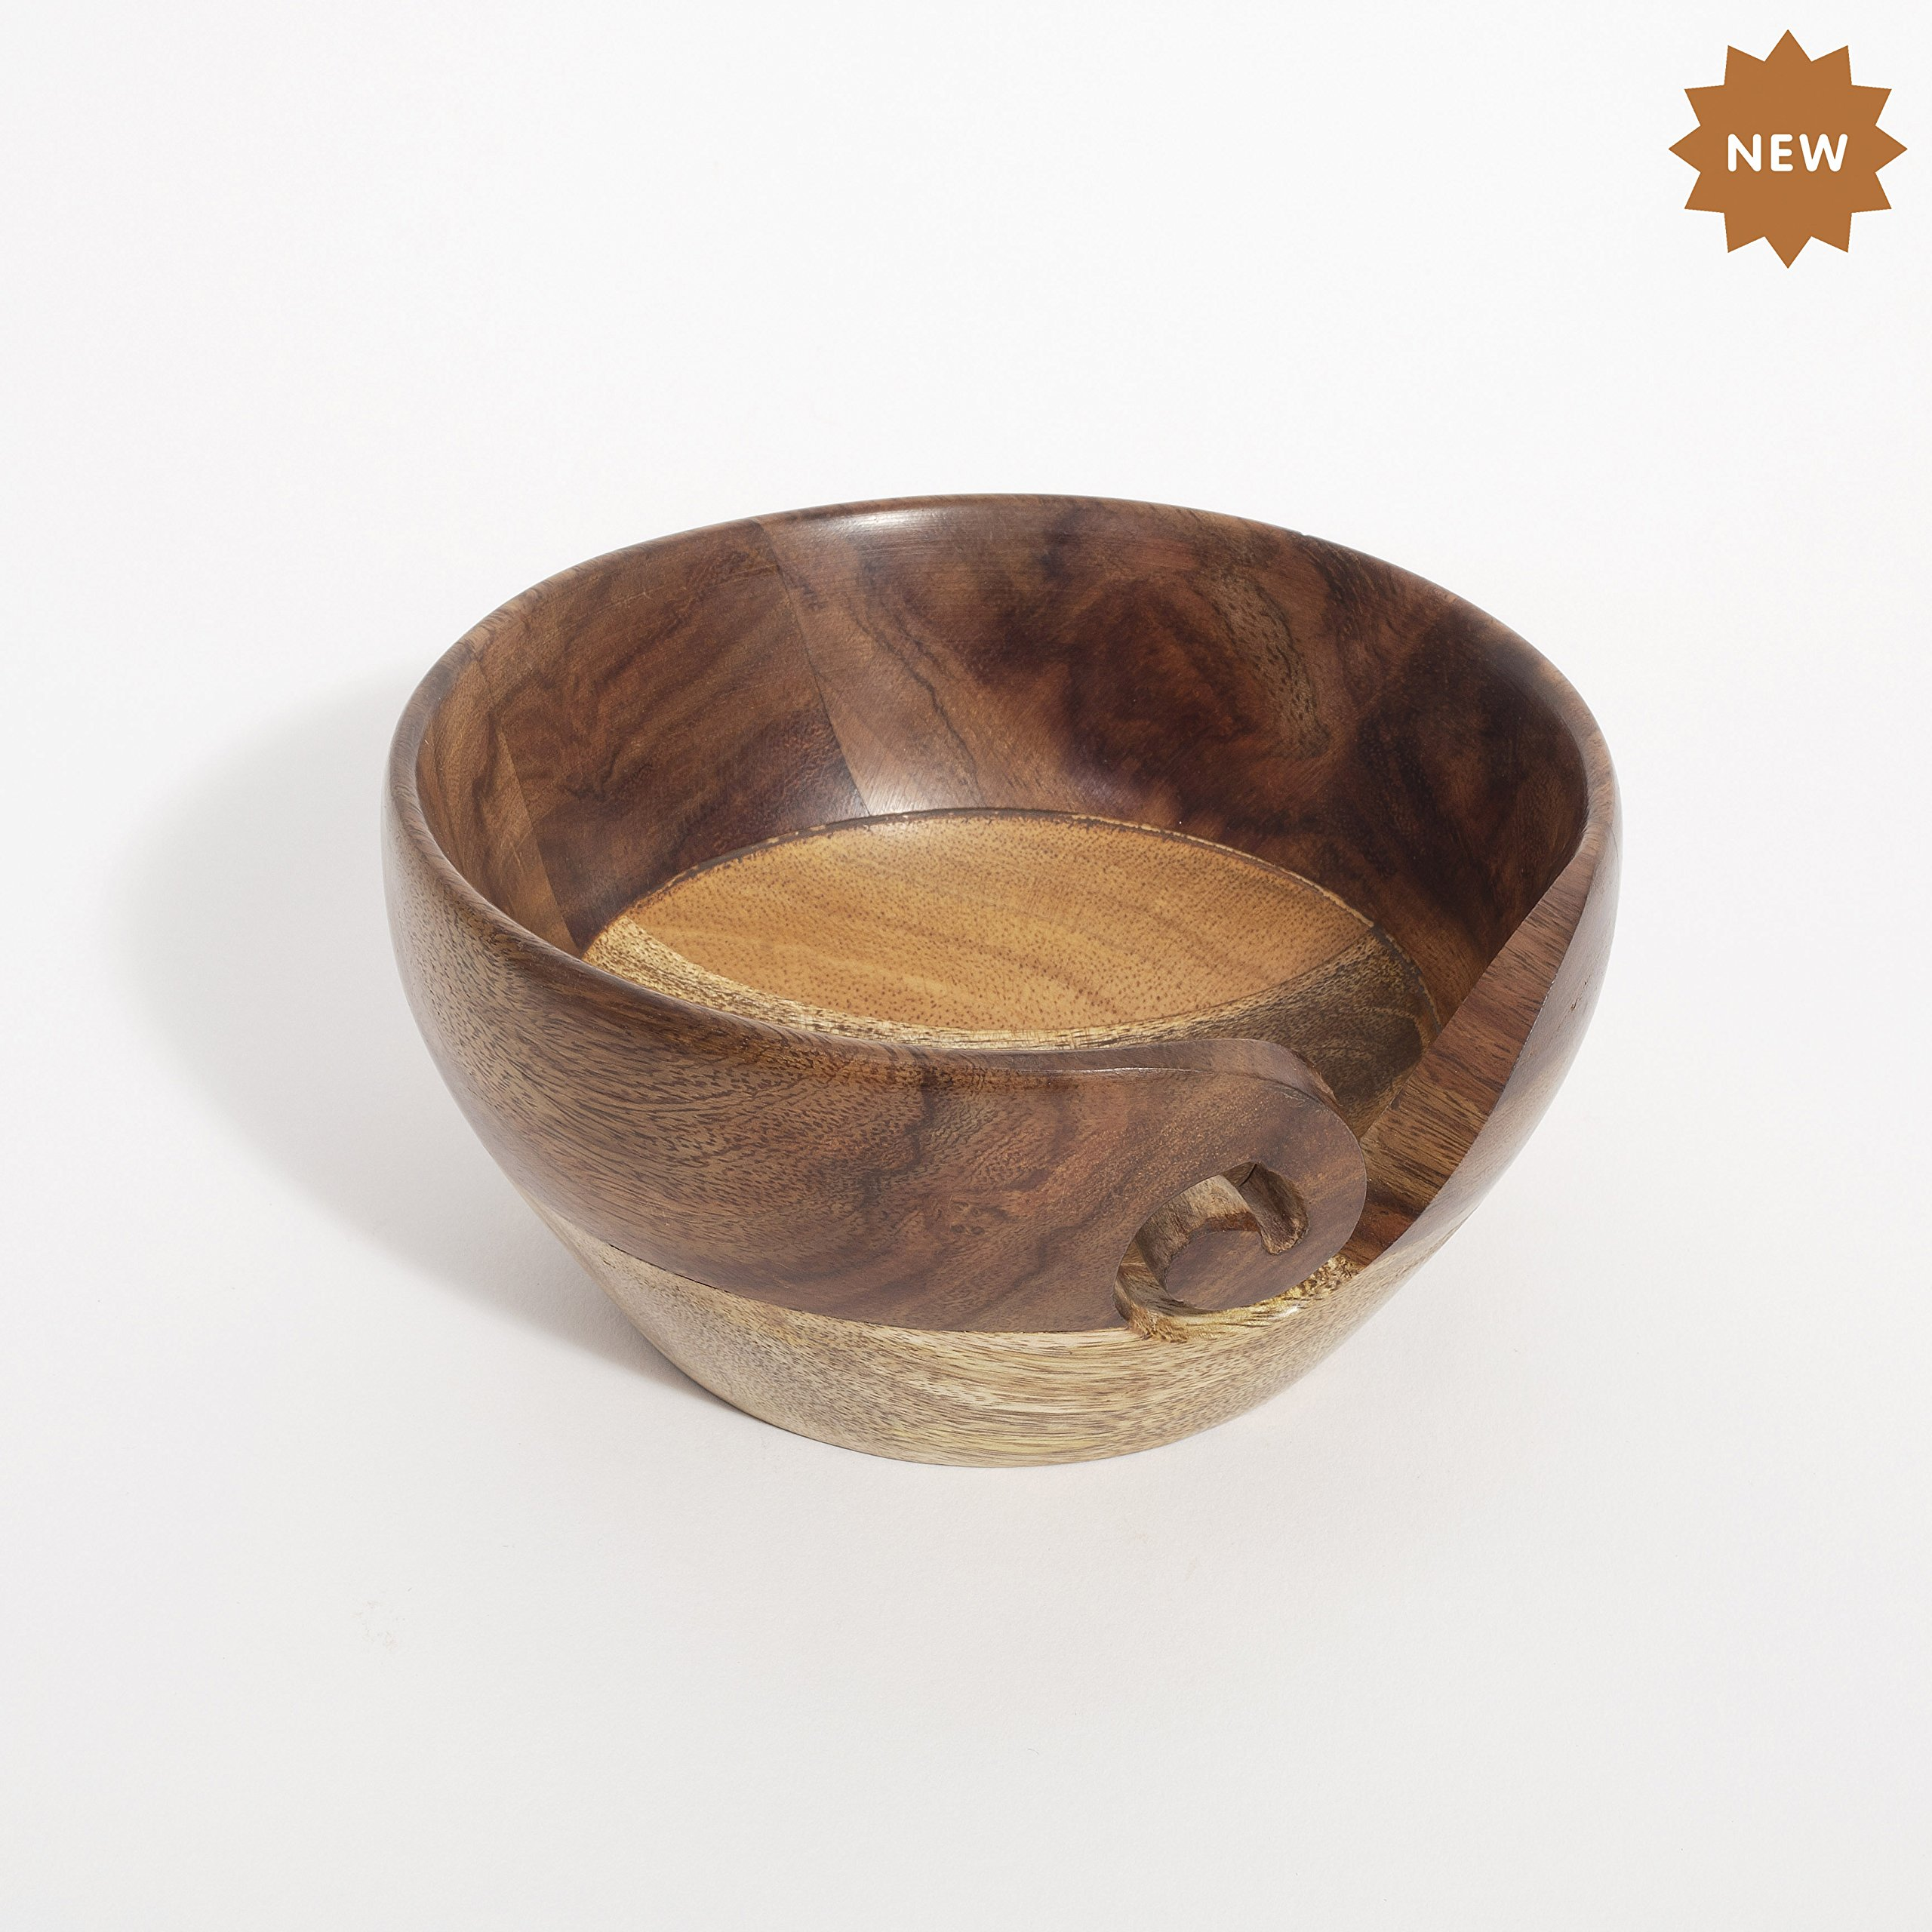 Rusticity Wooden Yarn Bowl/Knitting Bowl/Crochet Holder | Handmade | (5.6x5.6 in)